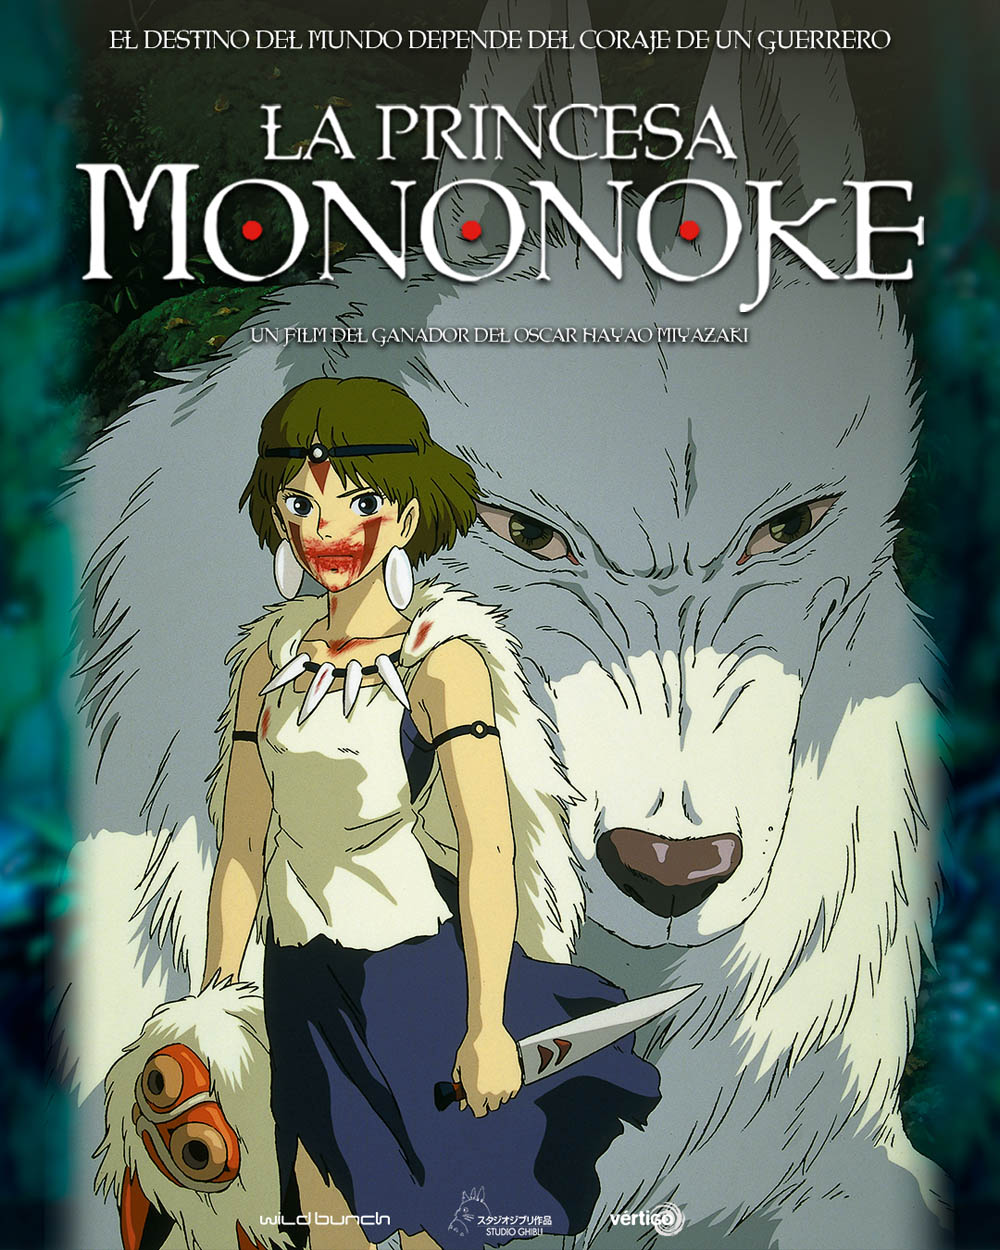 poster-mononoke-IG.jpg